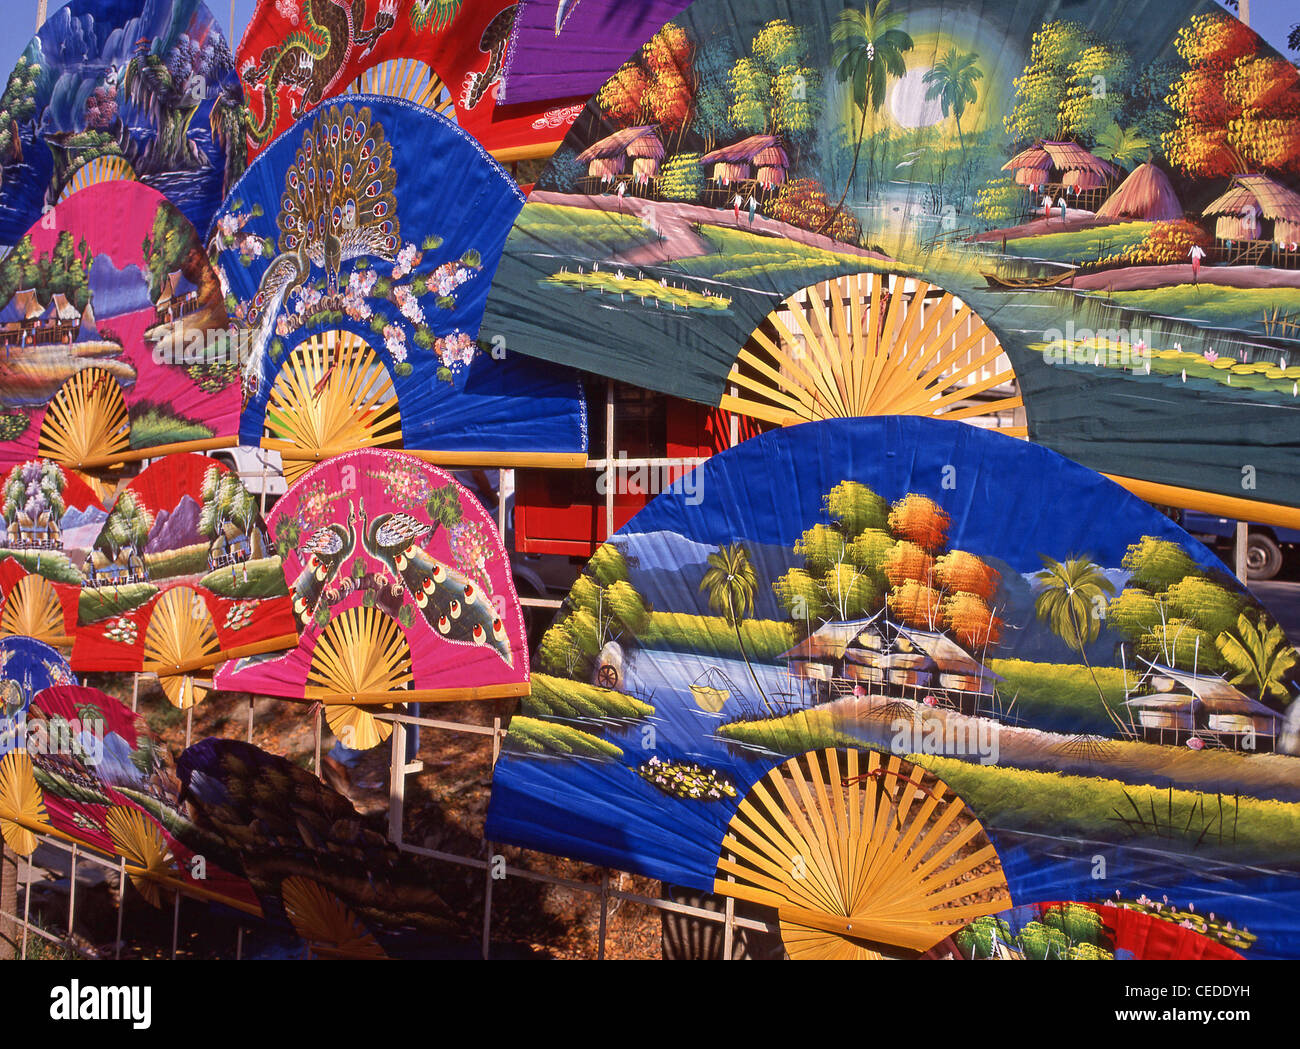 Colorati souvenir display ventilatore nel mercato, Bangkok, Samut Prakan Provincia, Thailandia Immagini Stock